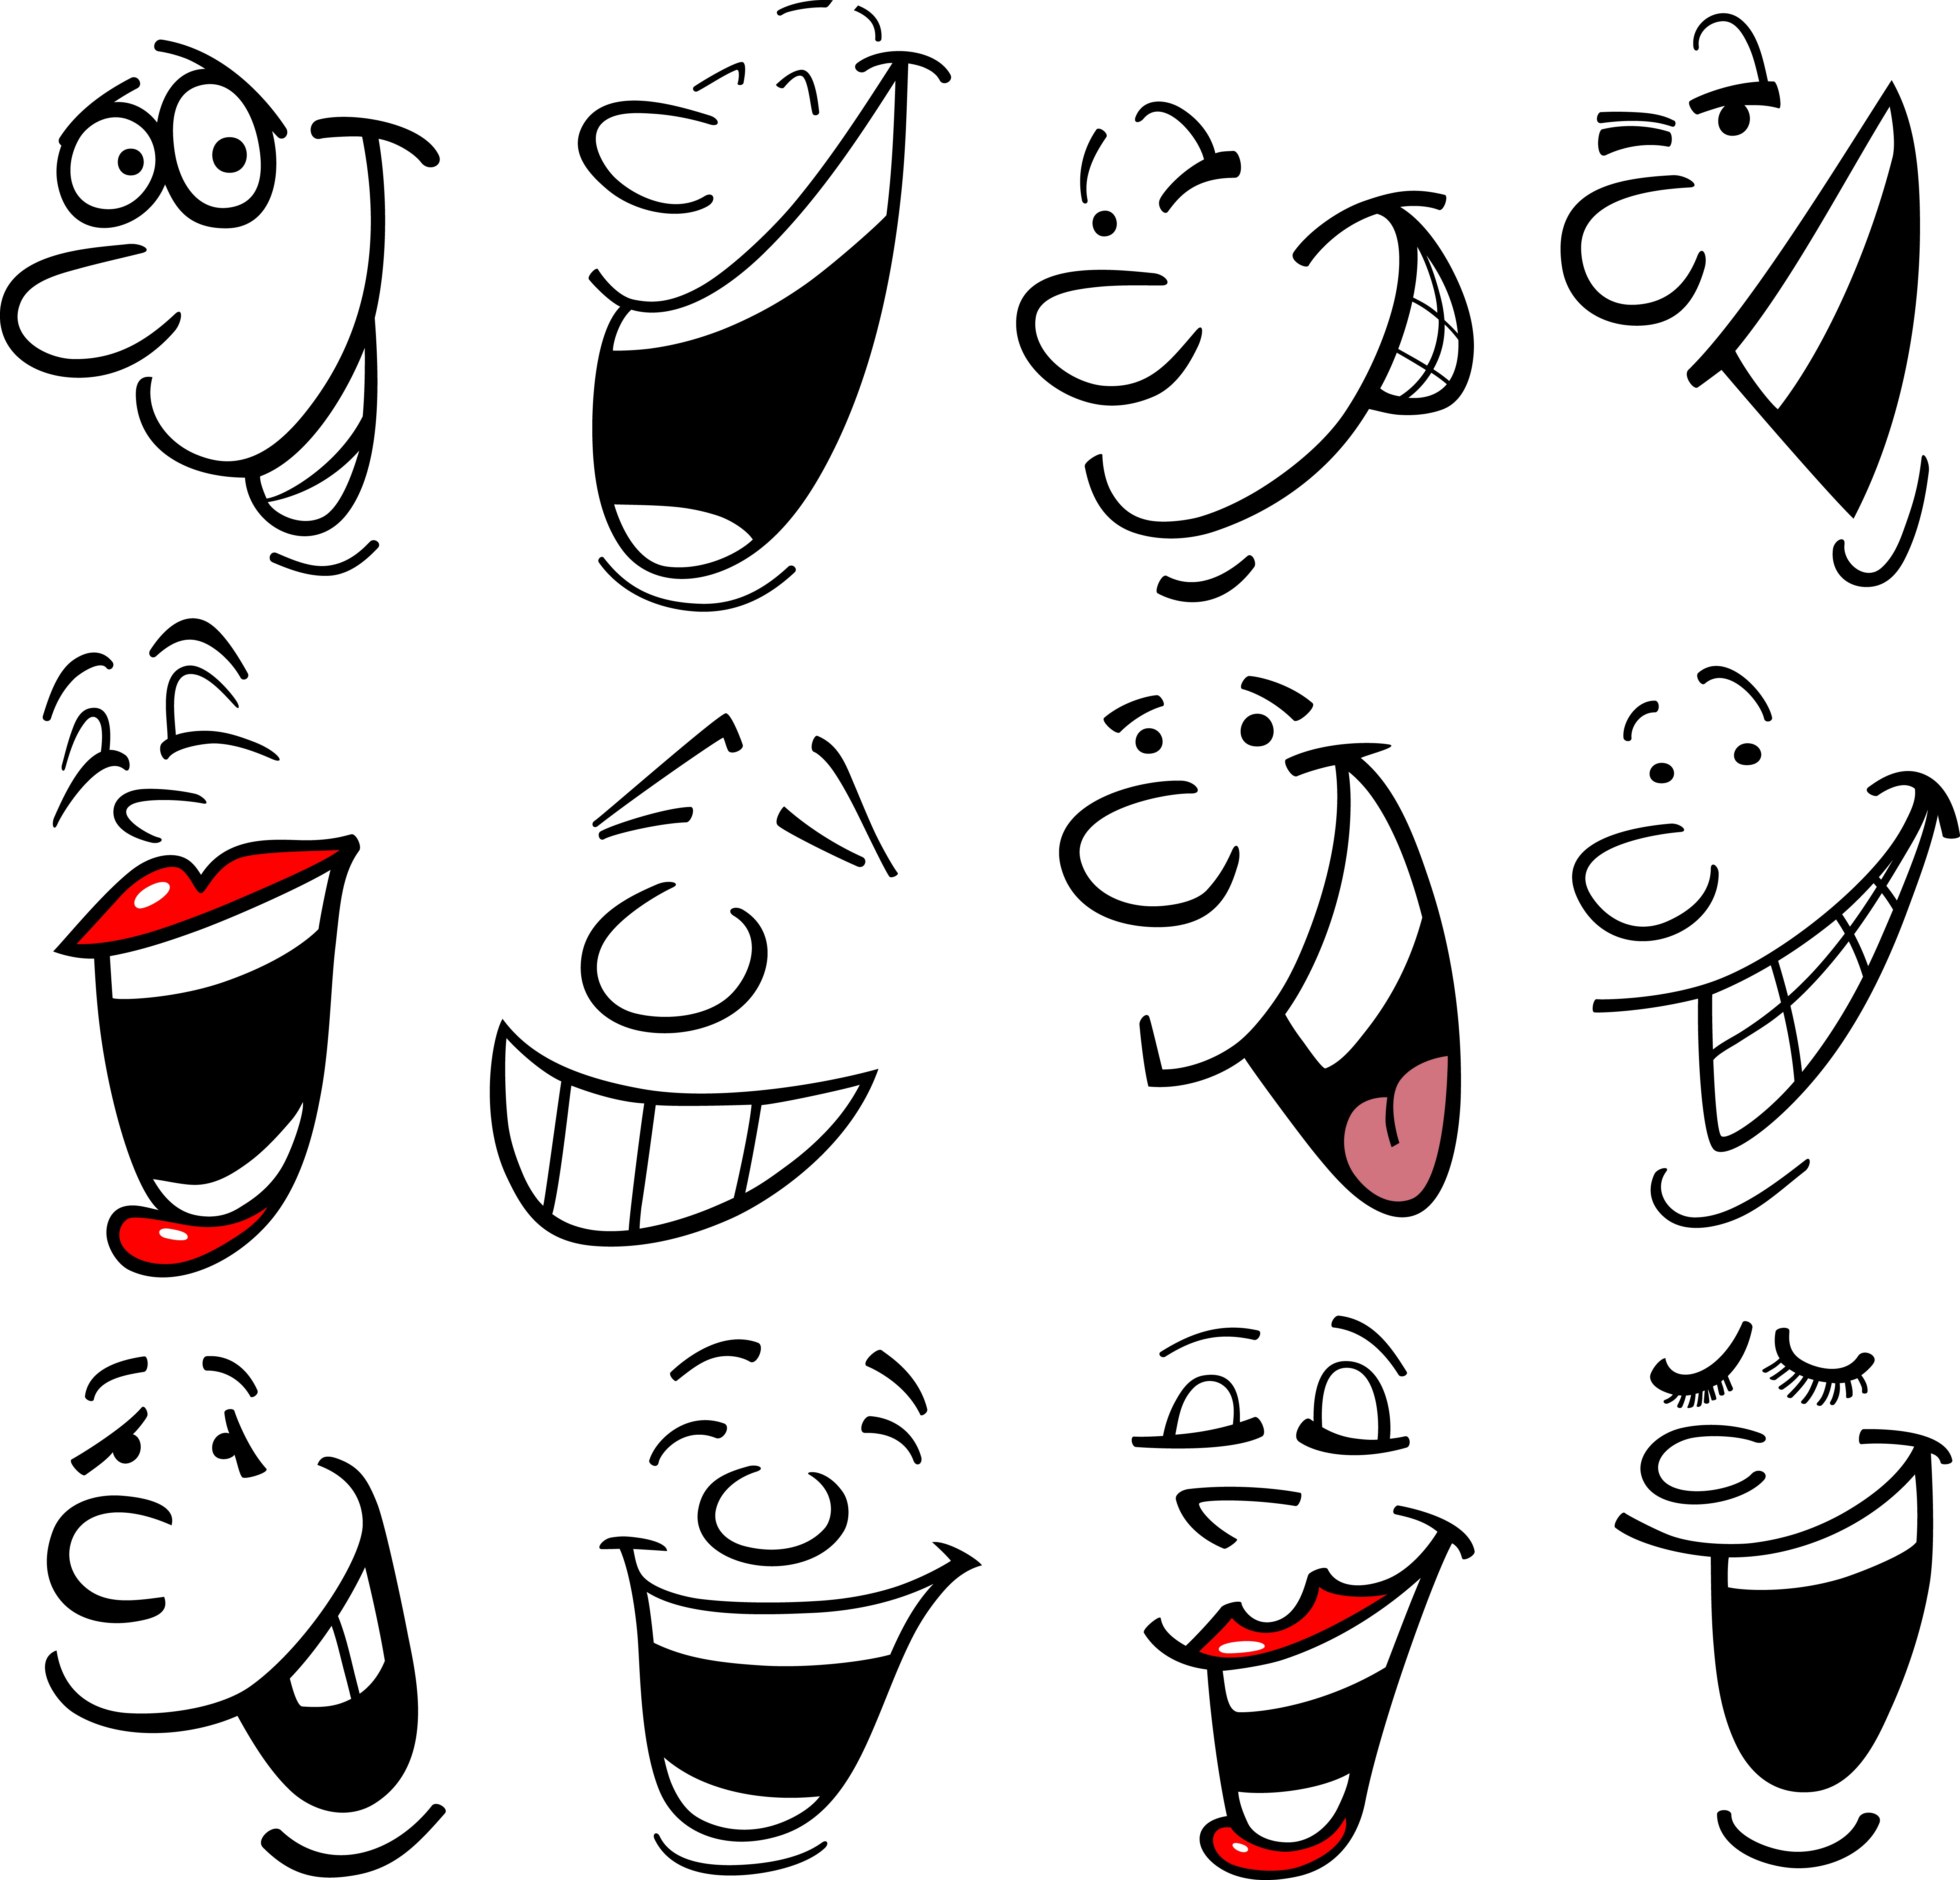 Laugh Cartoon Image